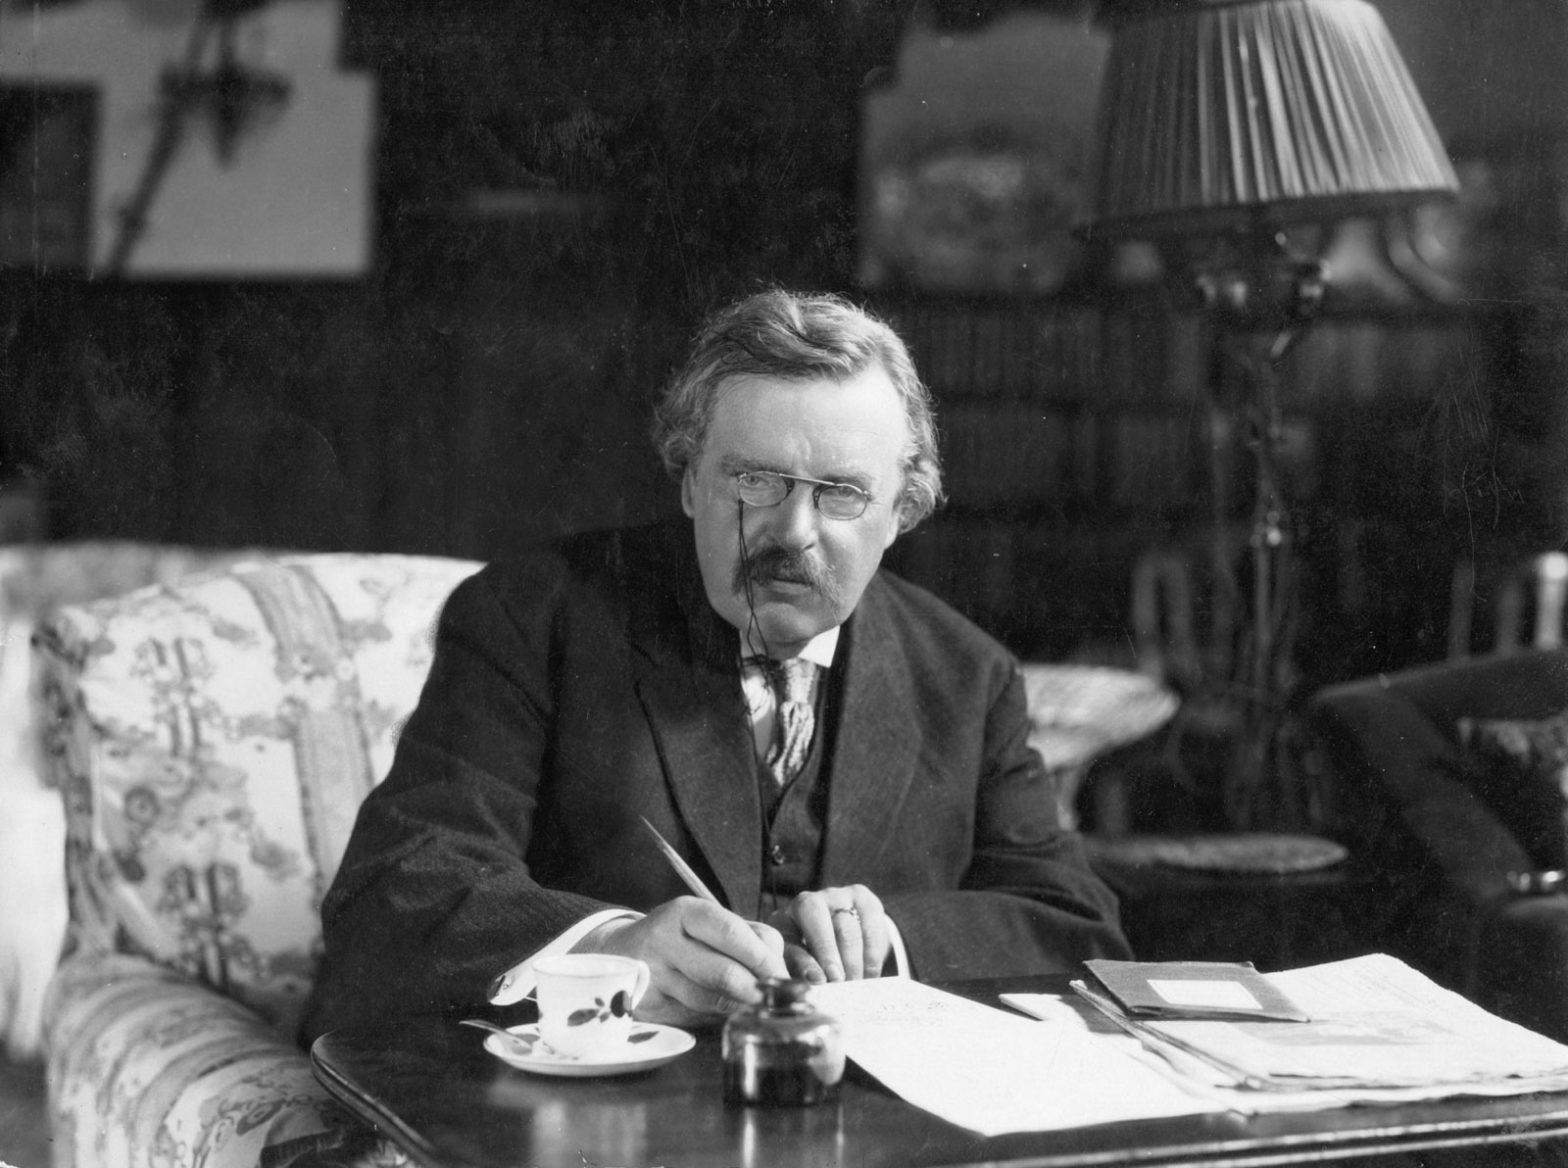 G.K. Chesterton at work